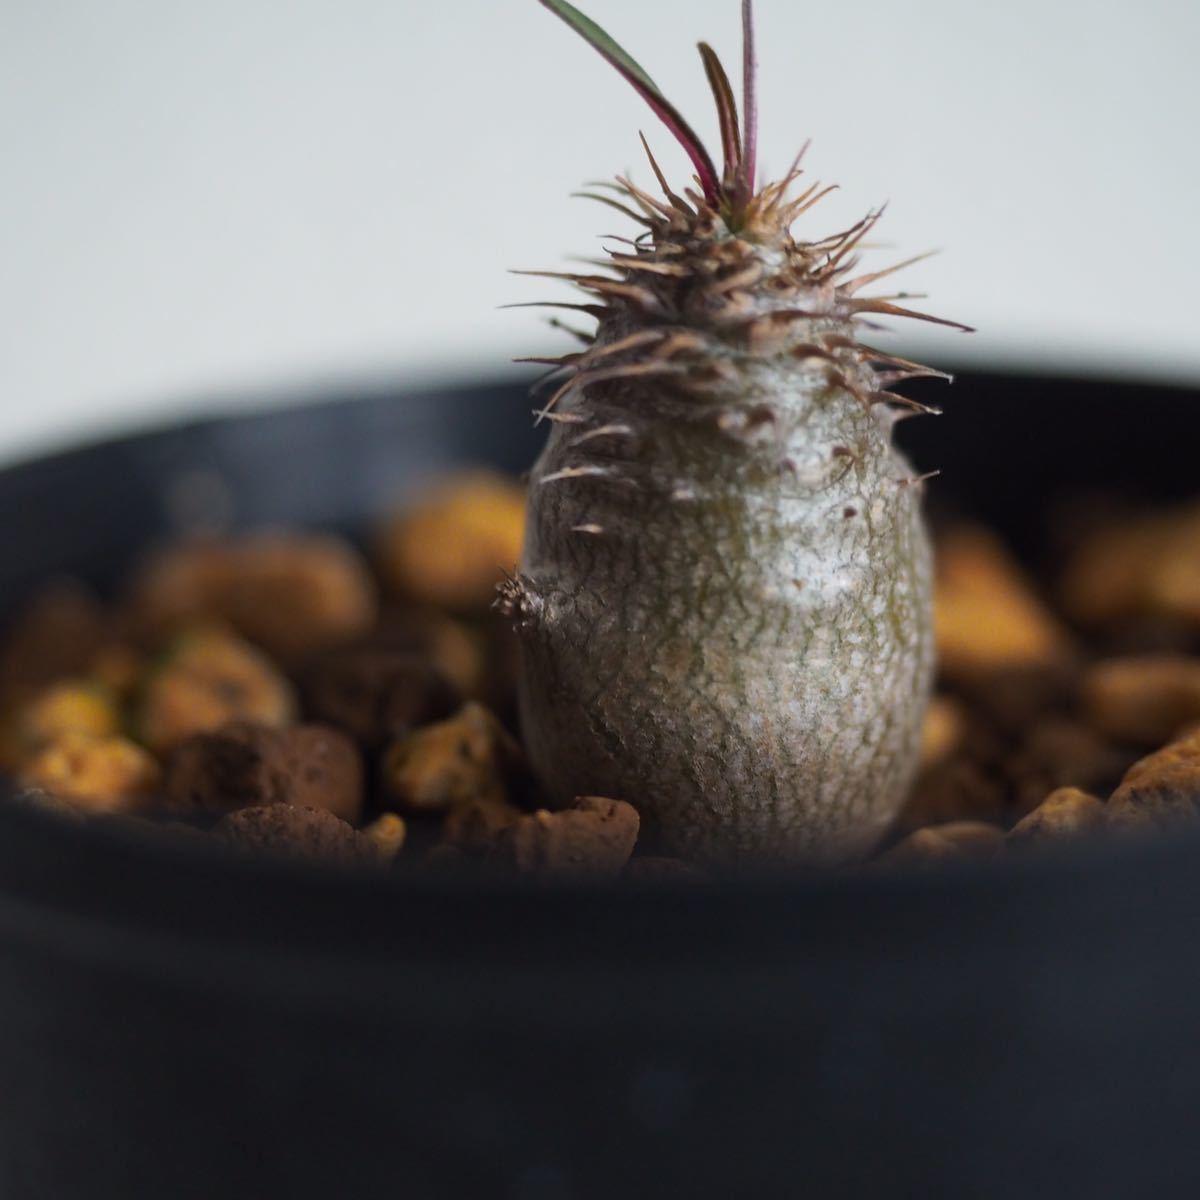 Pachypodium gracilius③【国内実生】パキポディウム グラキリス◆コーデックス 珍奇植物_画像2